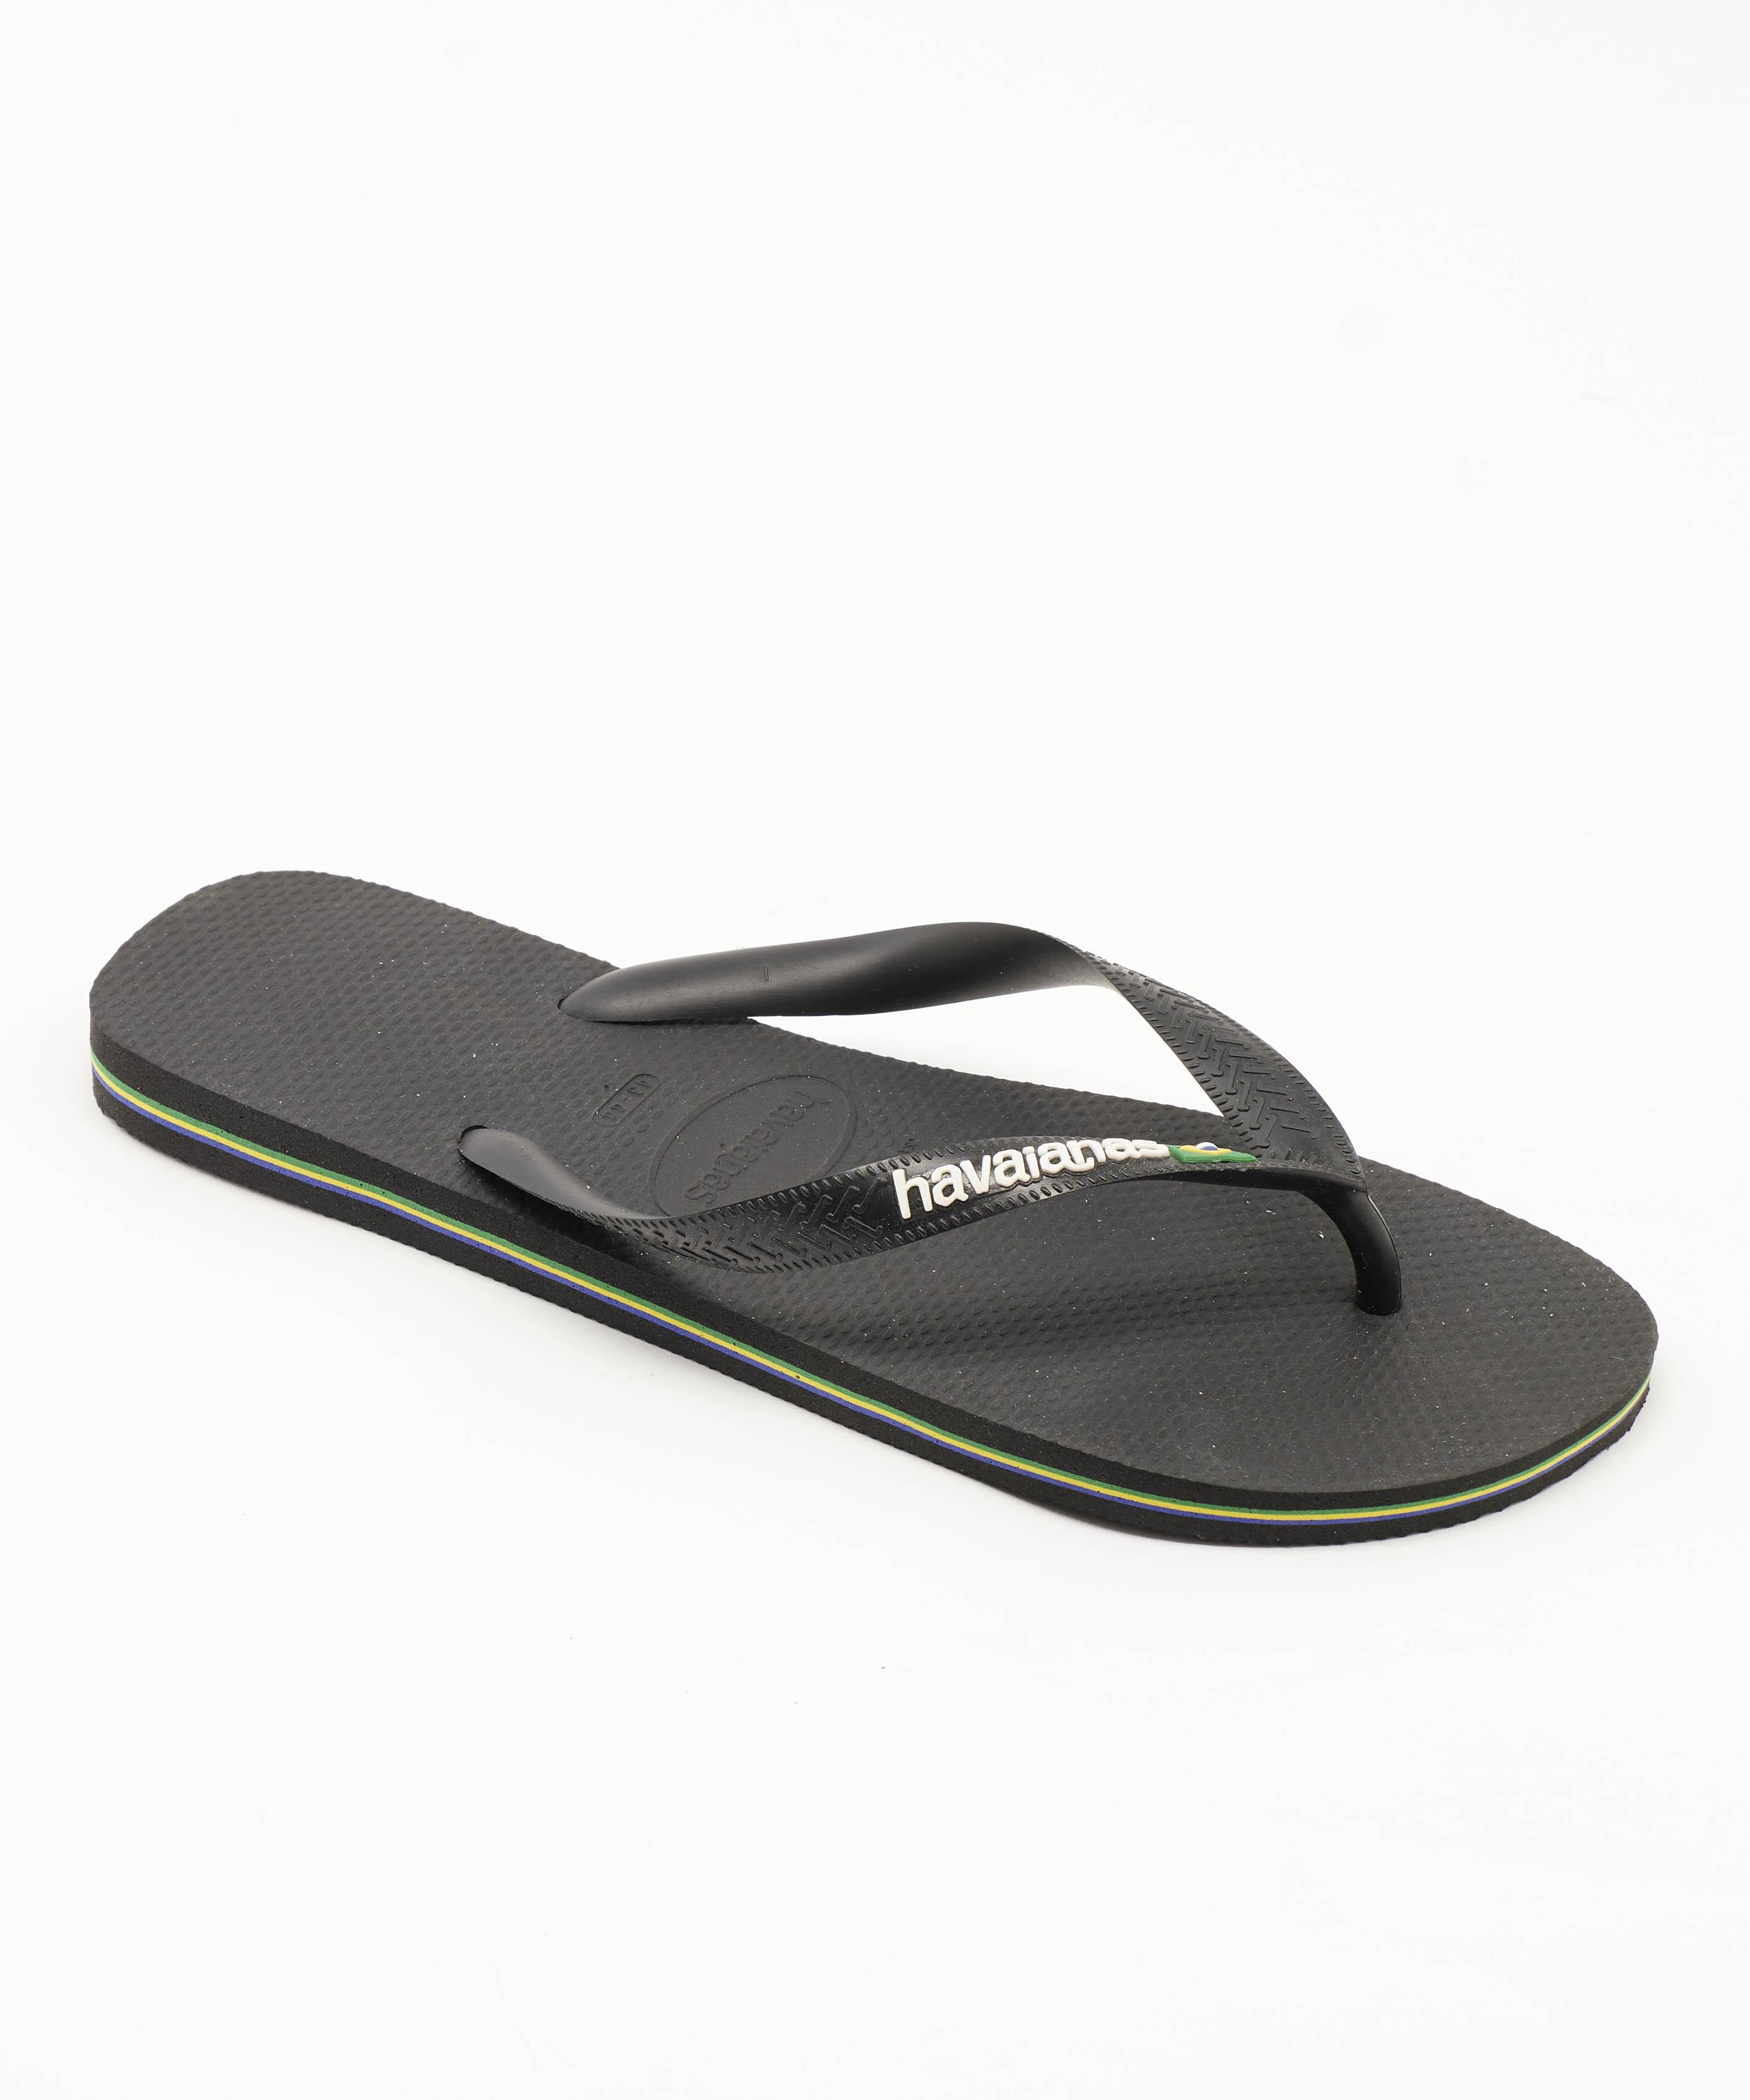 Tongs Homme - Tong Noir Havaianas - 4110850-1069